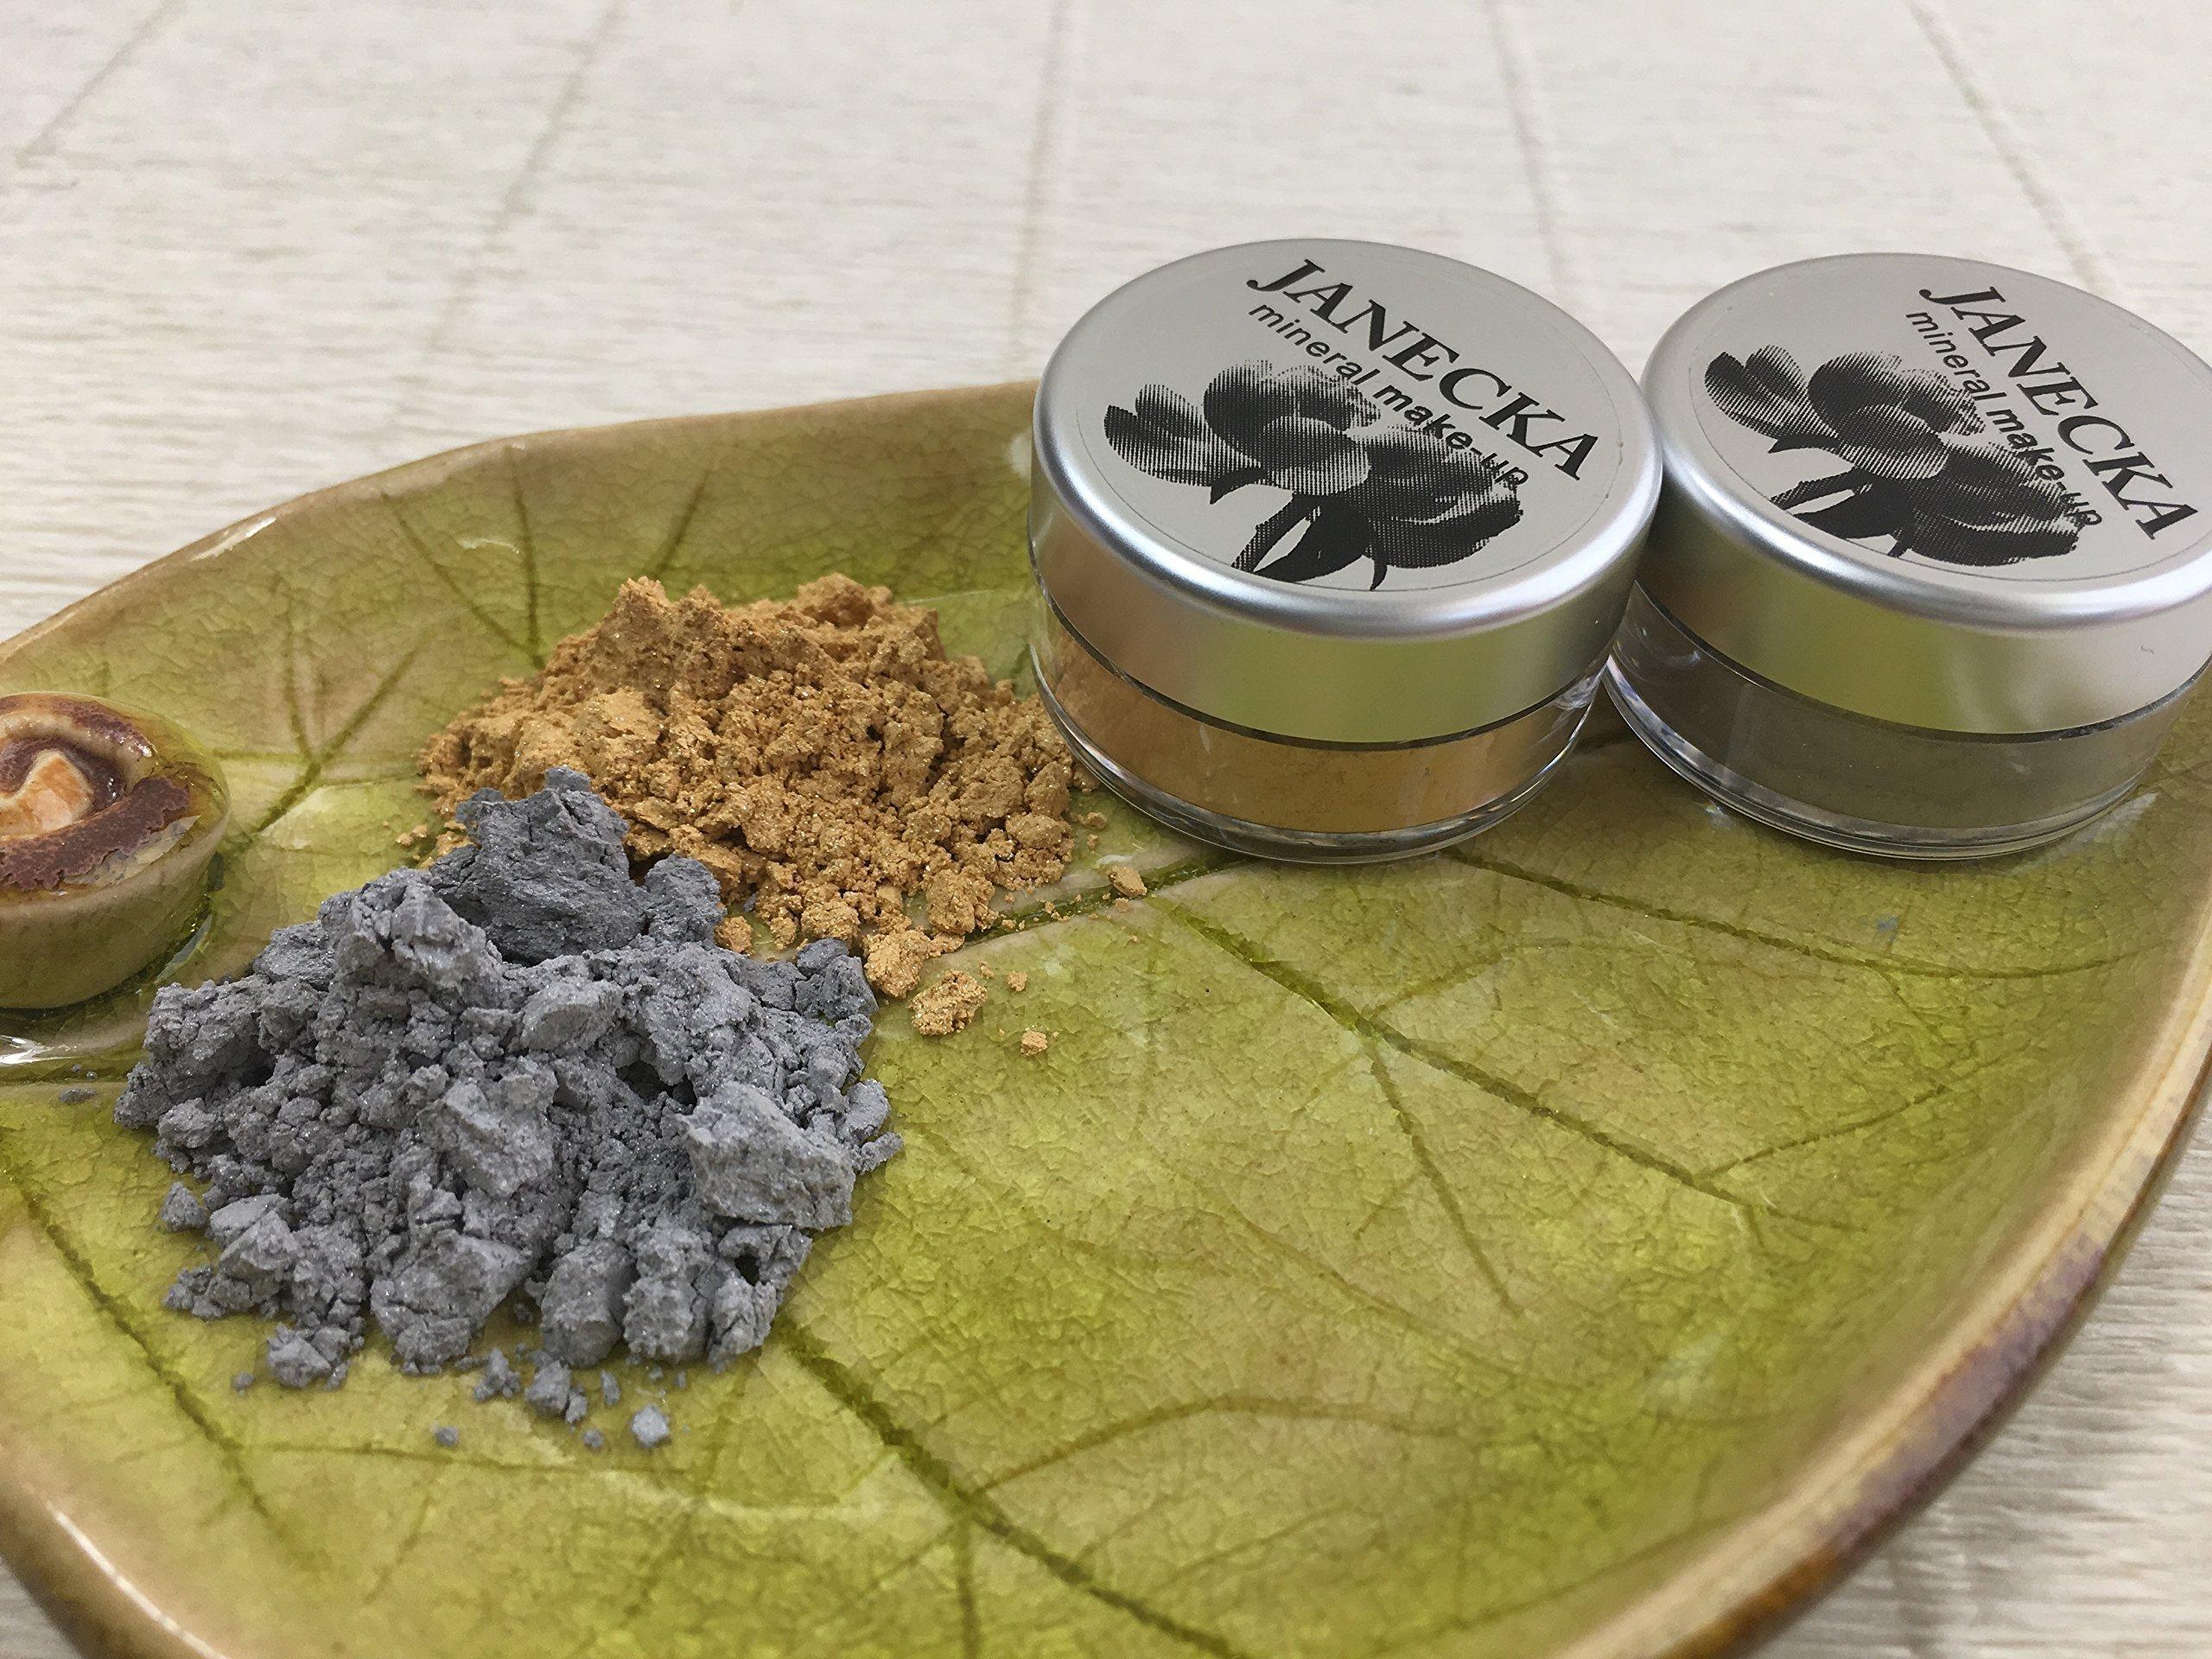 JANECKA Shimmer Eye Shadow - Handcrafted - Mineral Make-Up - Gift Set